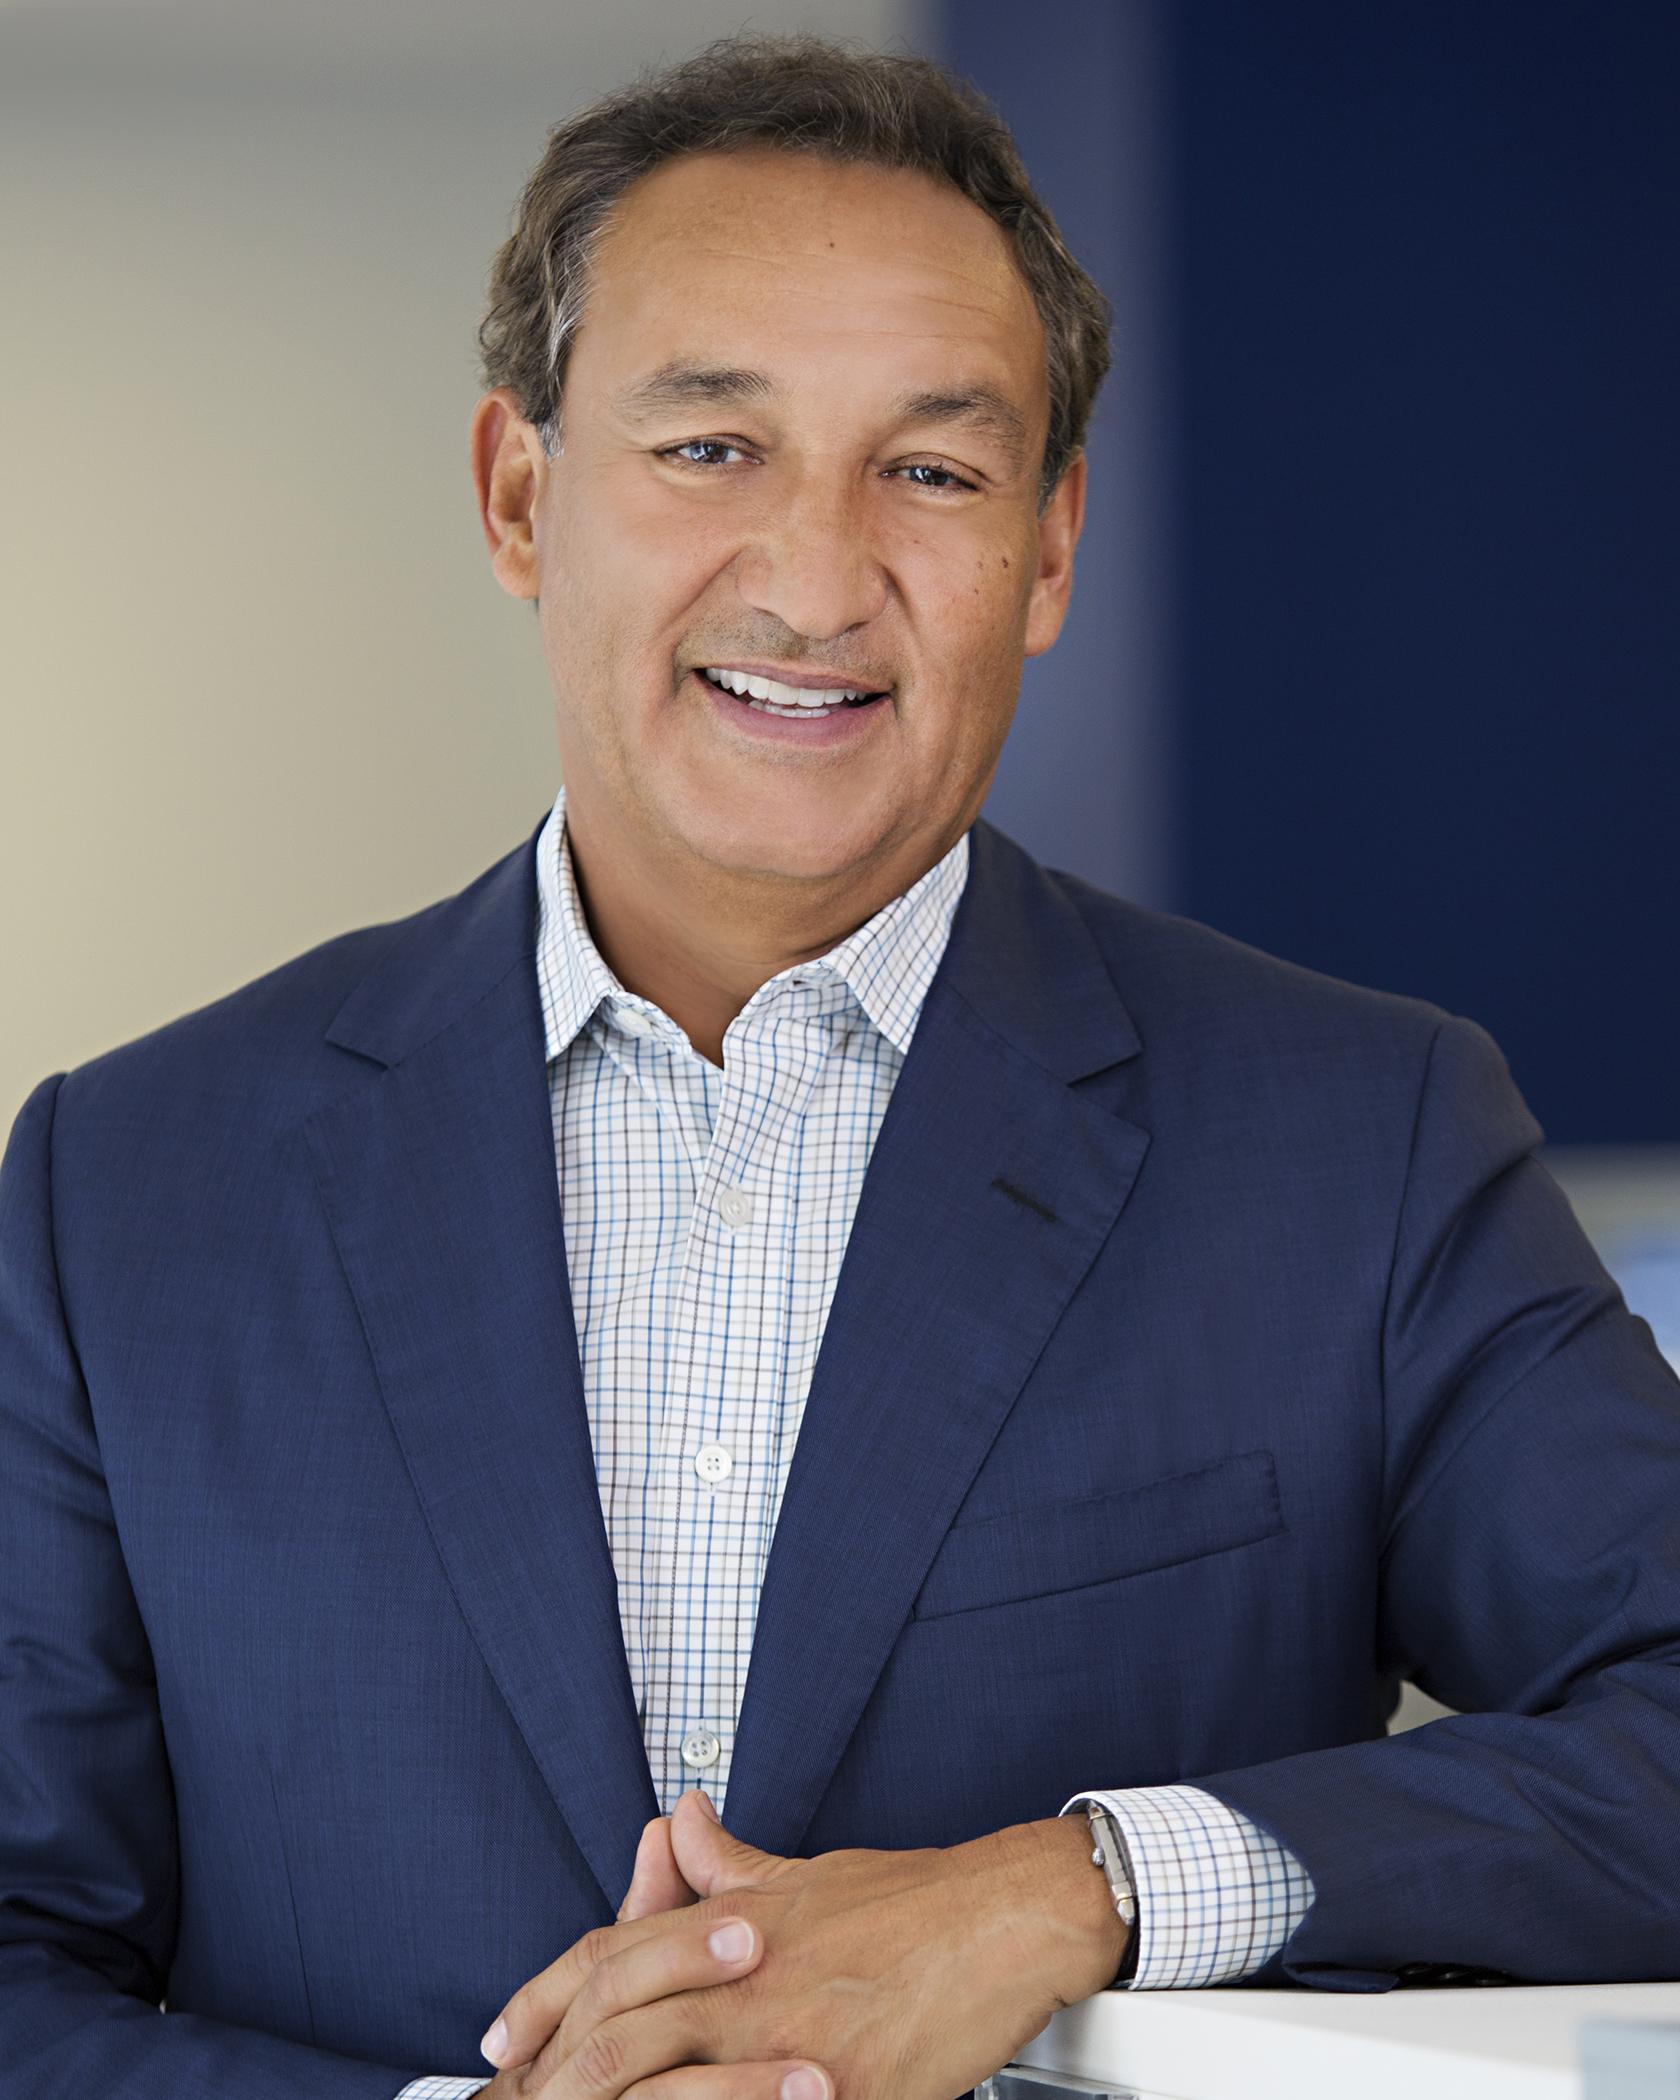 United Continental Holdings CEO Oscar Munoz